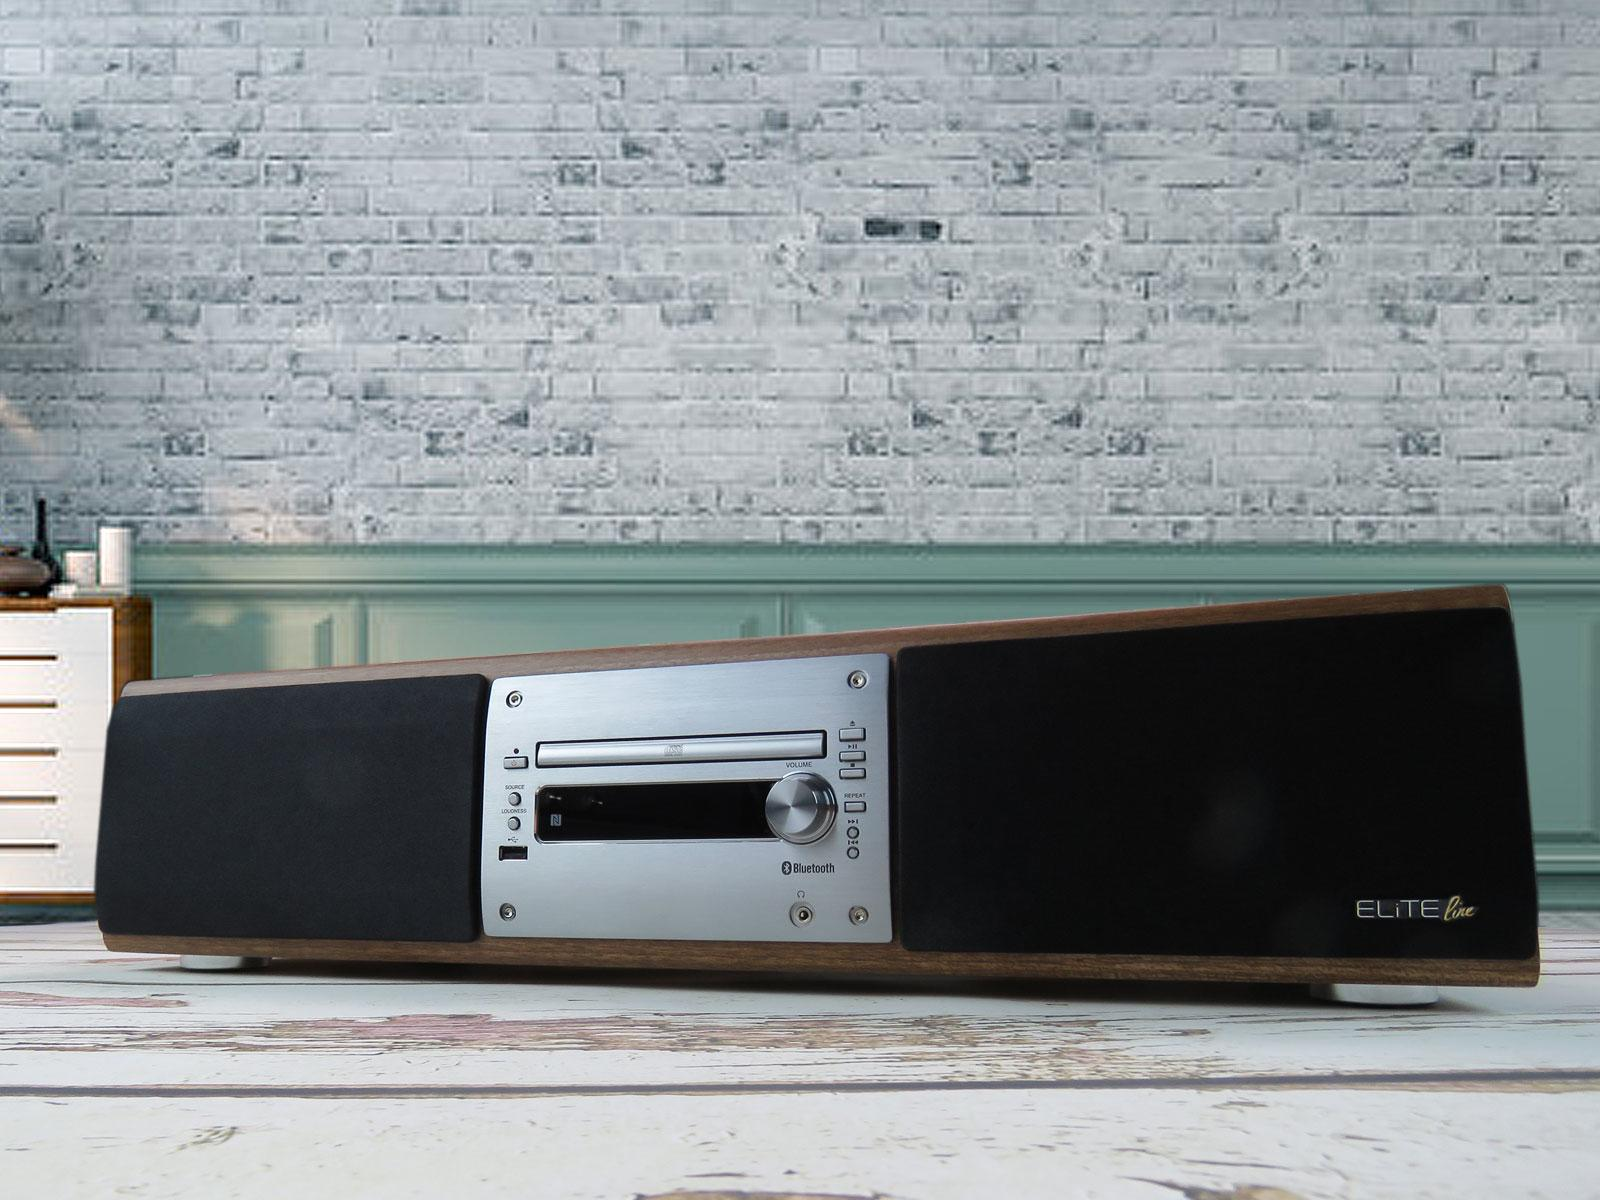 Buy Soundmaster Dab1000 Dab Hifi System With Bluetooth